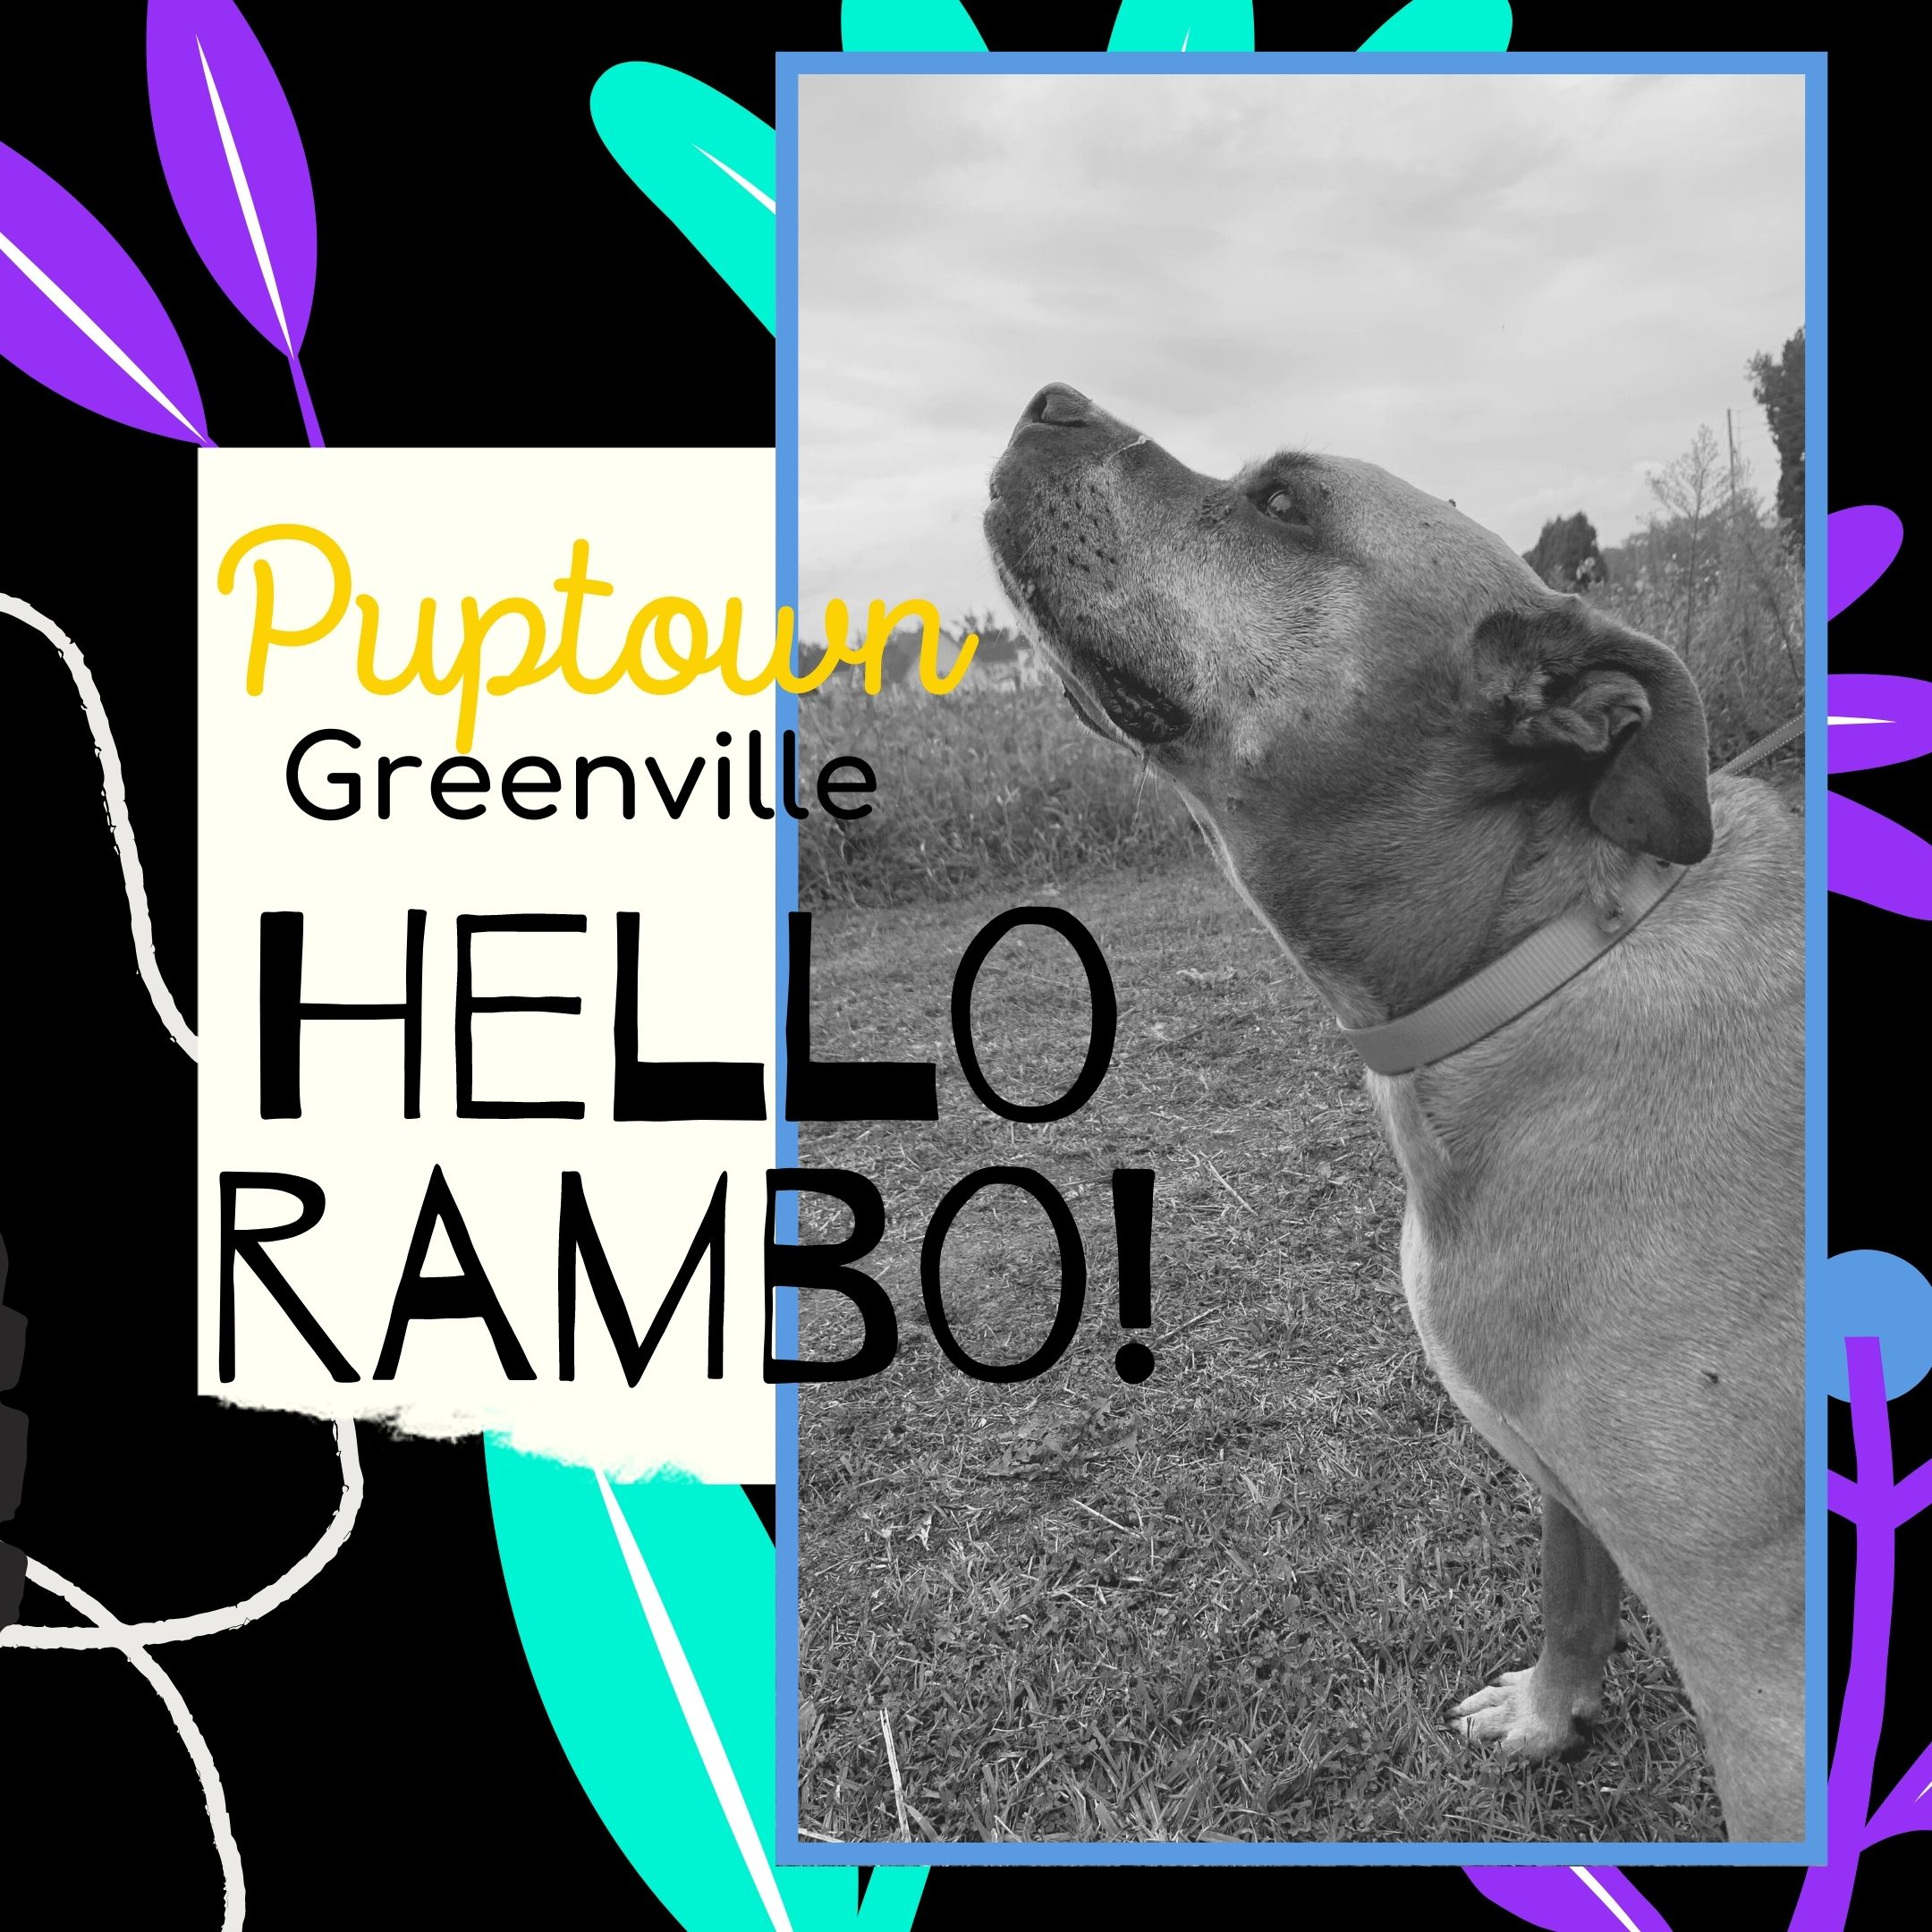 Dog Boarding Greenville NC